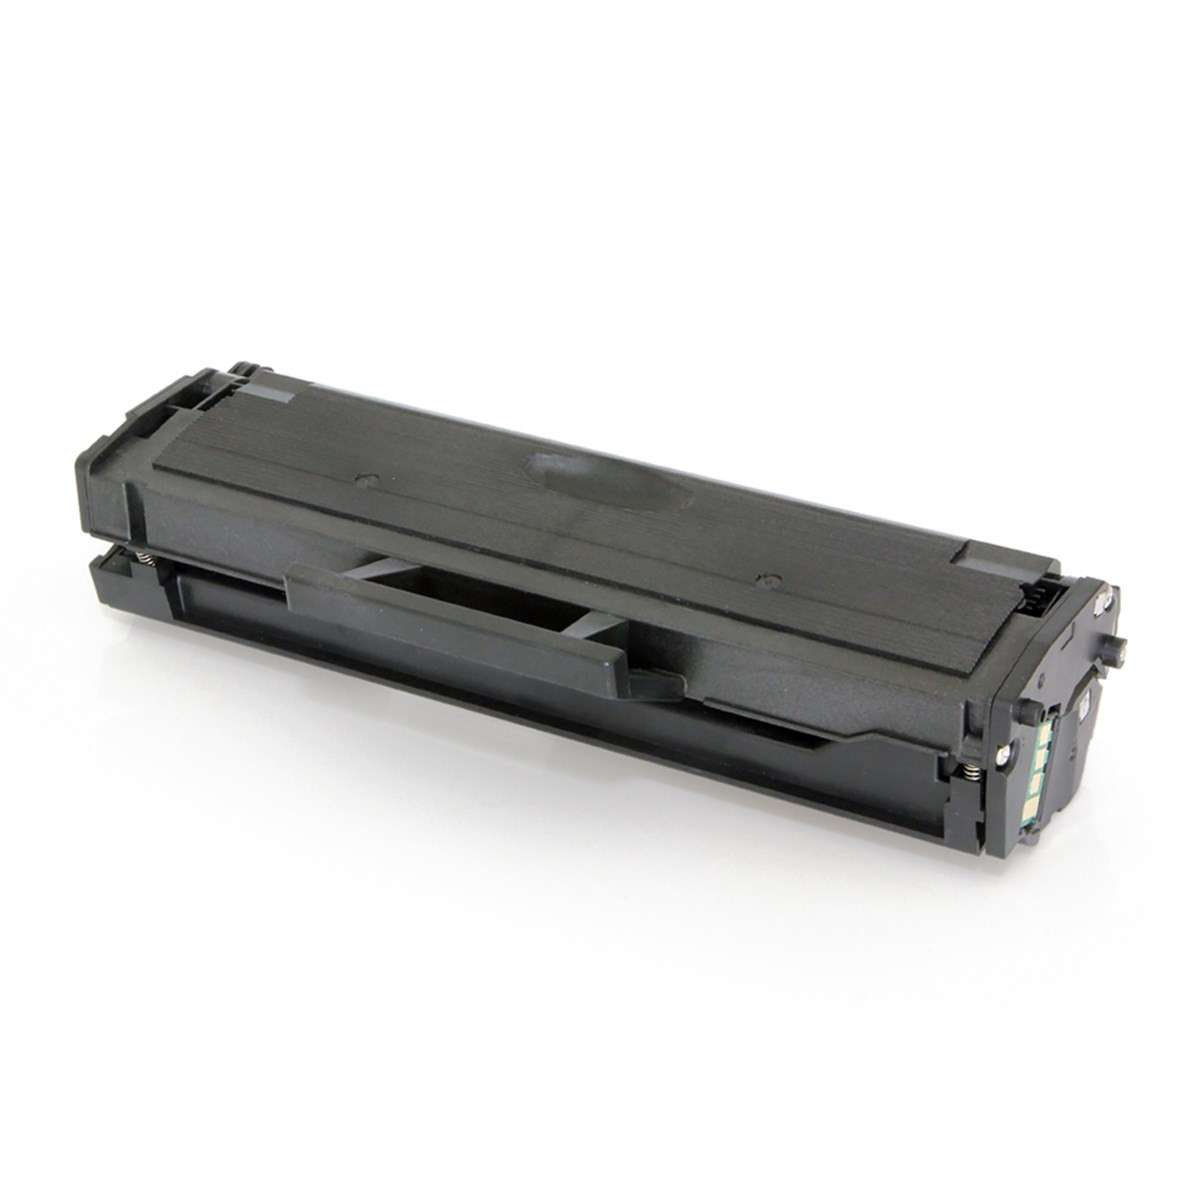 Toner Compatível com Xerox Workcentre 3025 WC3025 Phaser 3020 | 106R02773 | Premium Quality 1.5k